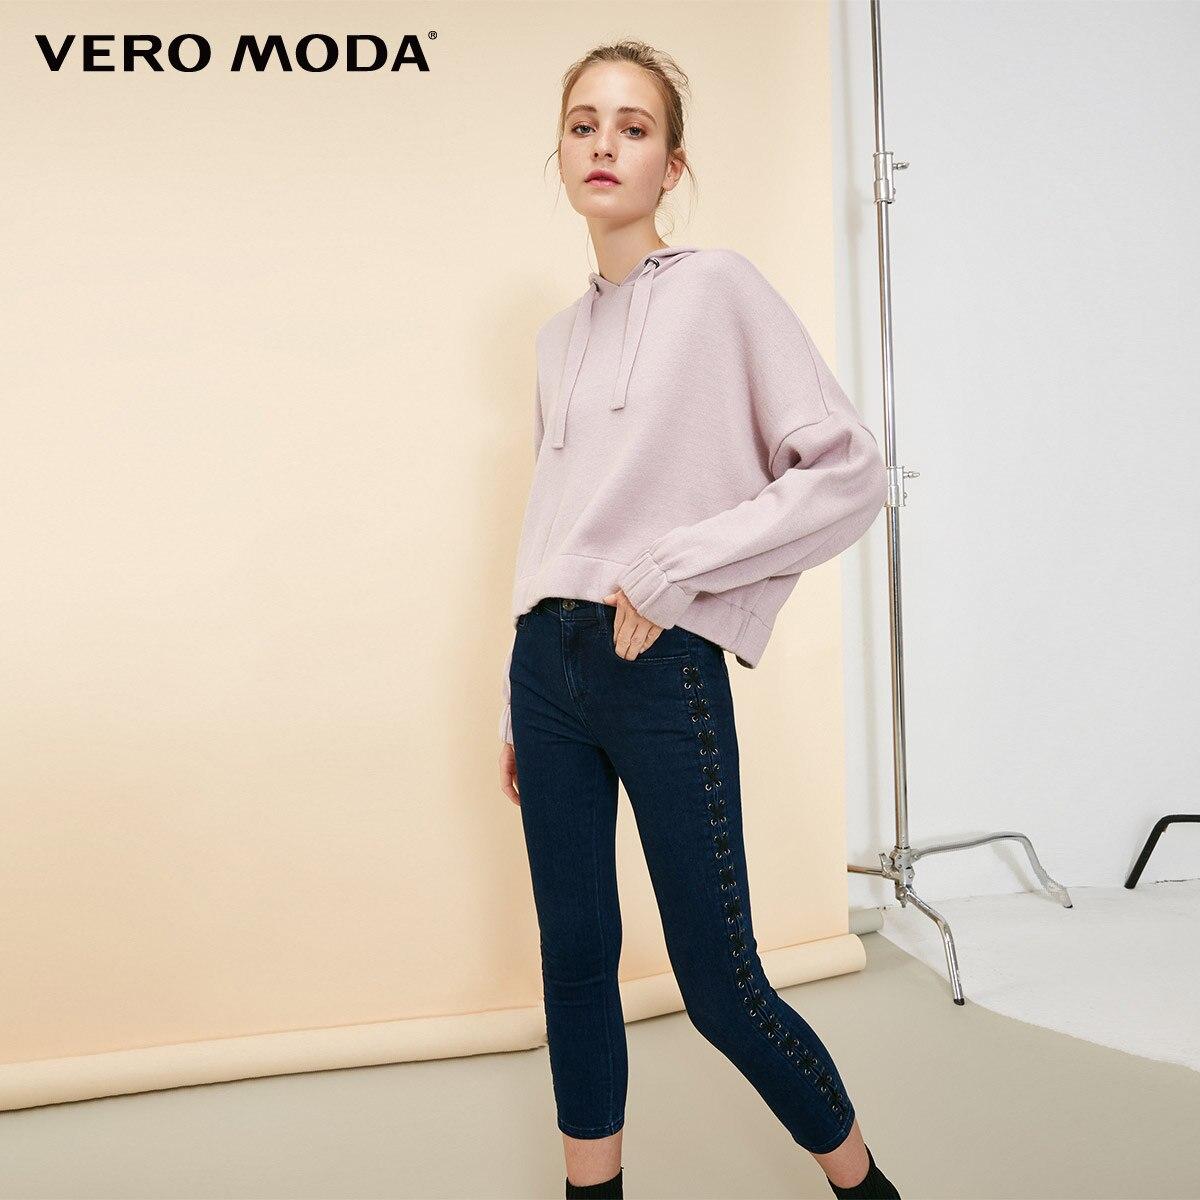 Vero Moda 2019 New Arrivals Women's Mid Waist Lace-up Capri Jeans | 31836I505